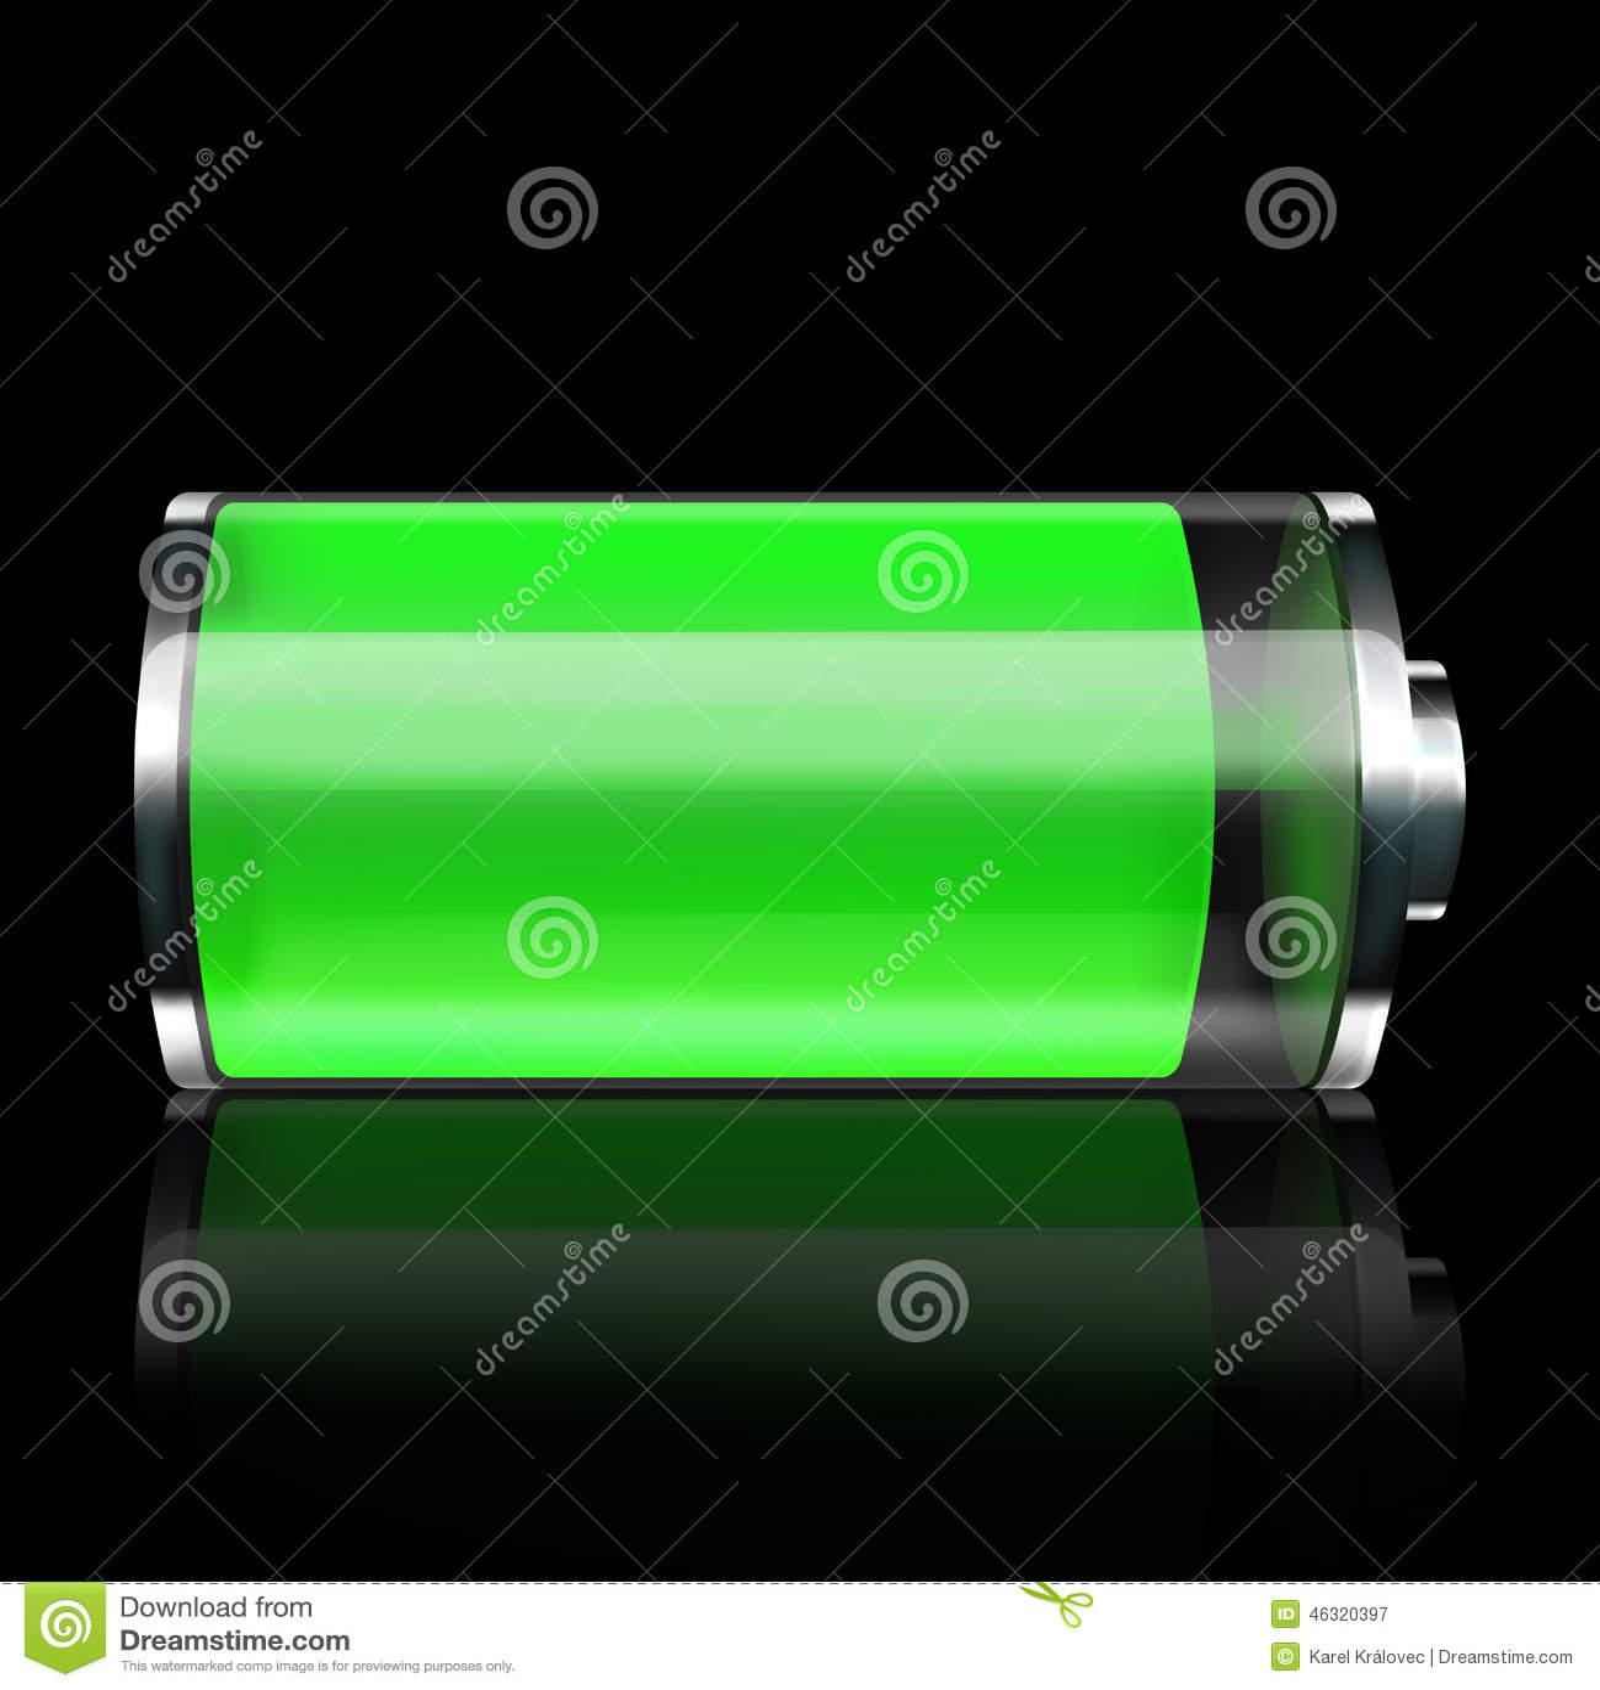 battery stock illustration